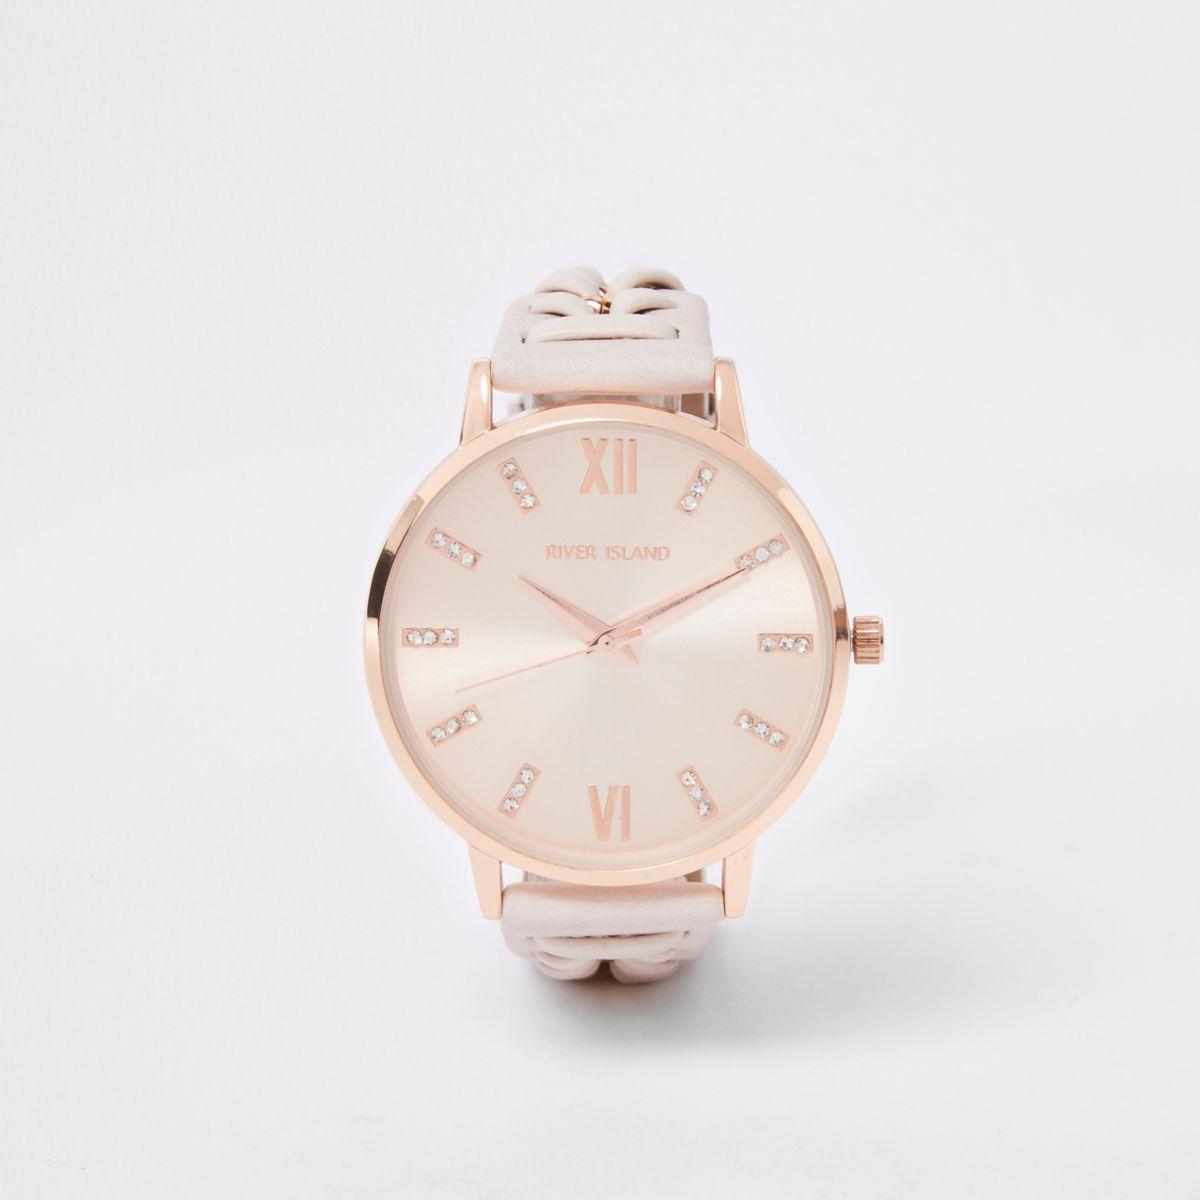 Cream woven chain watch